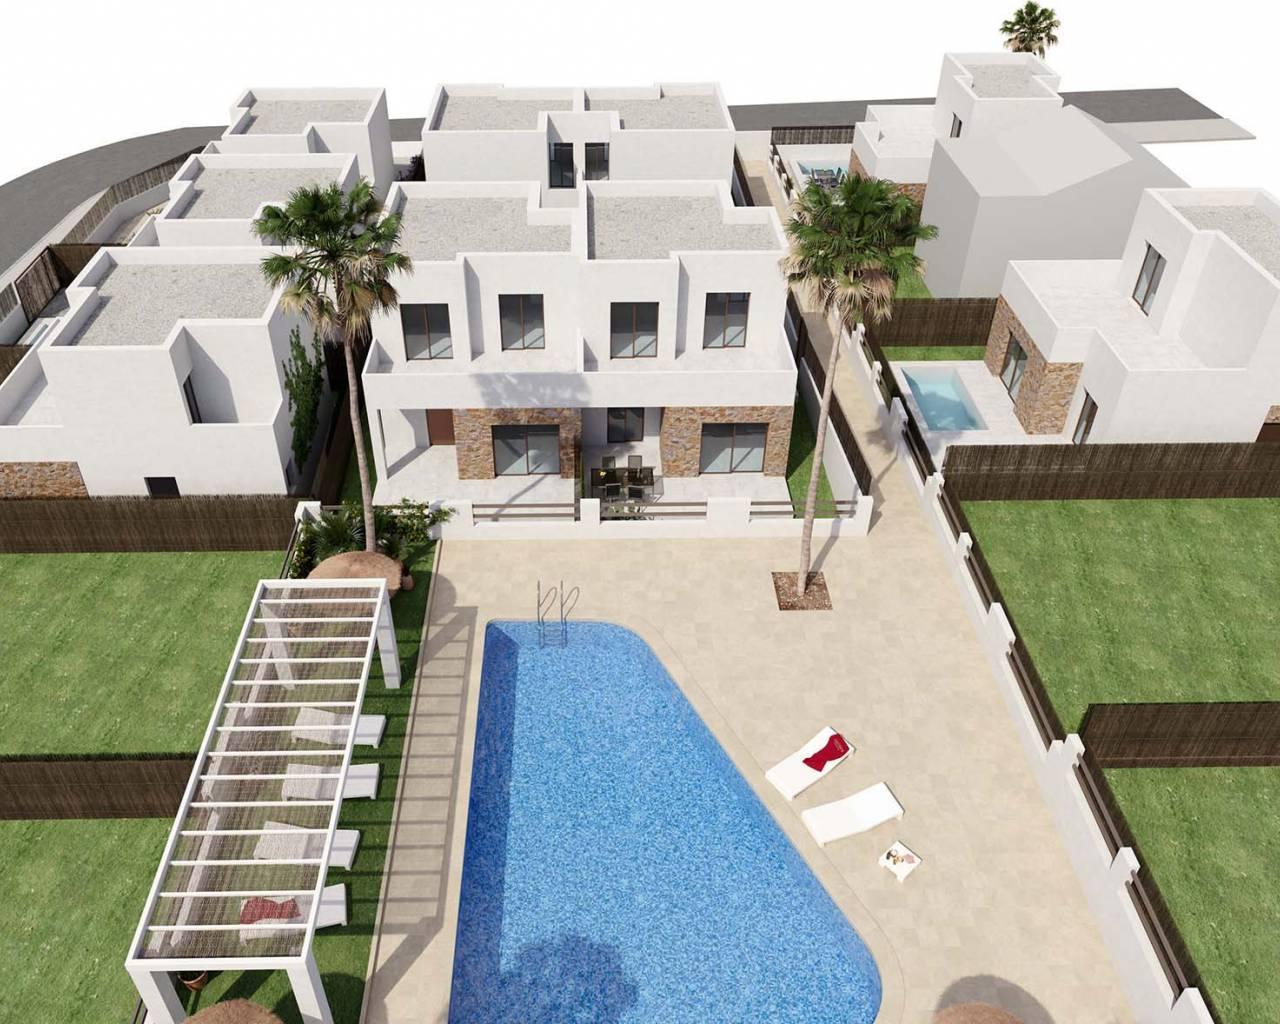 nieuwbouw-kwadrantwoning-orihuela-costa-villamartin-golf_5493_xl